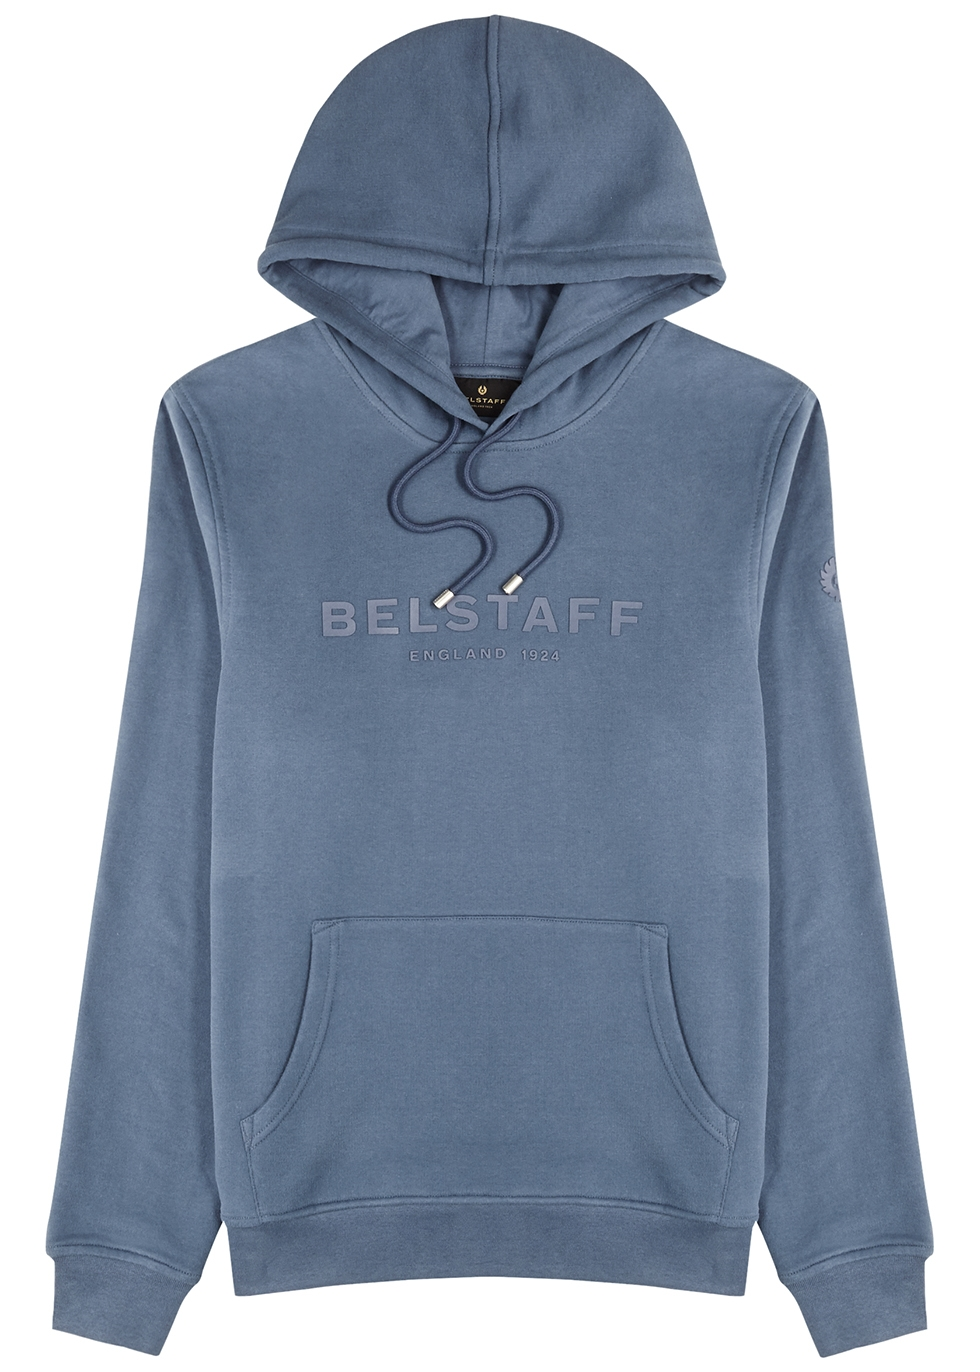 Blue logo hooded cotton sweatshirt